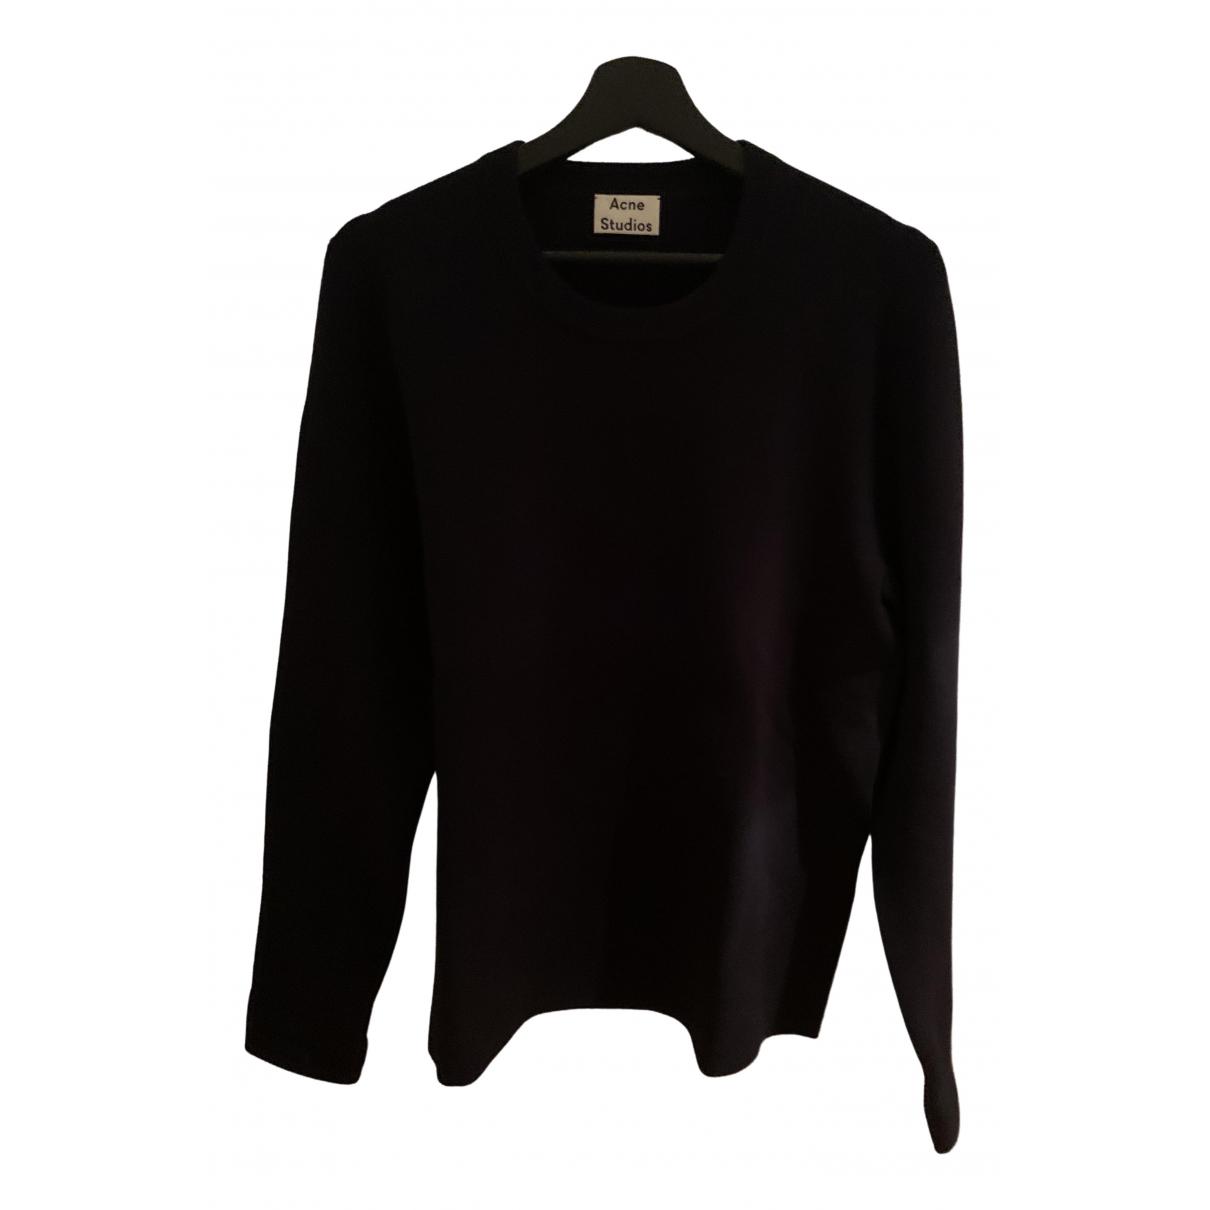 Acne Studios \N Black Knitwear & Sweatshirts for Men M International